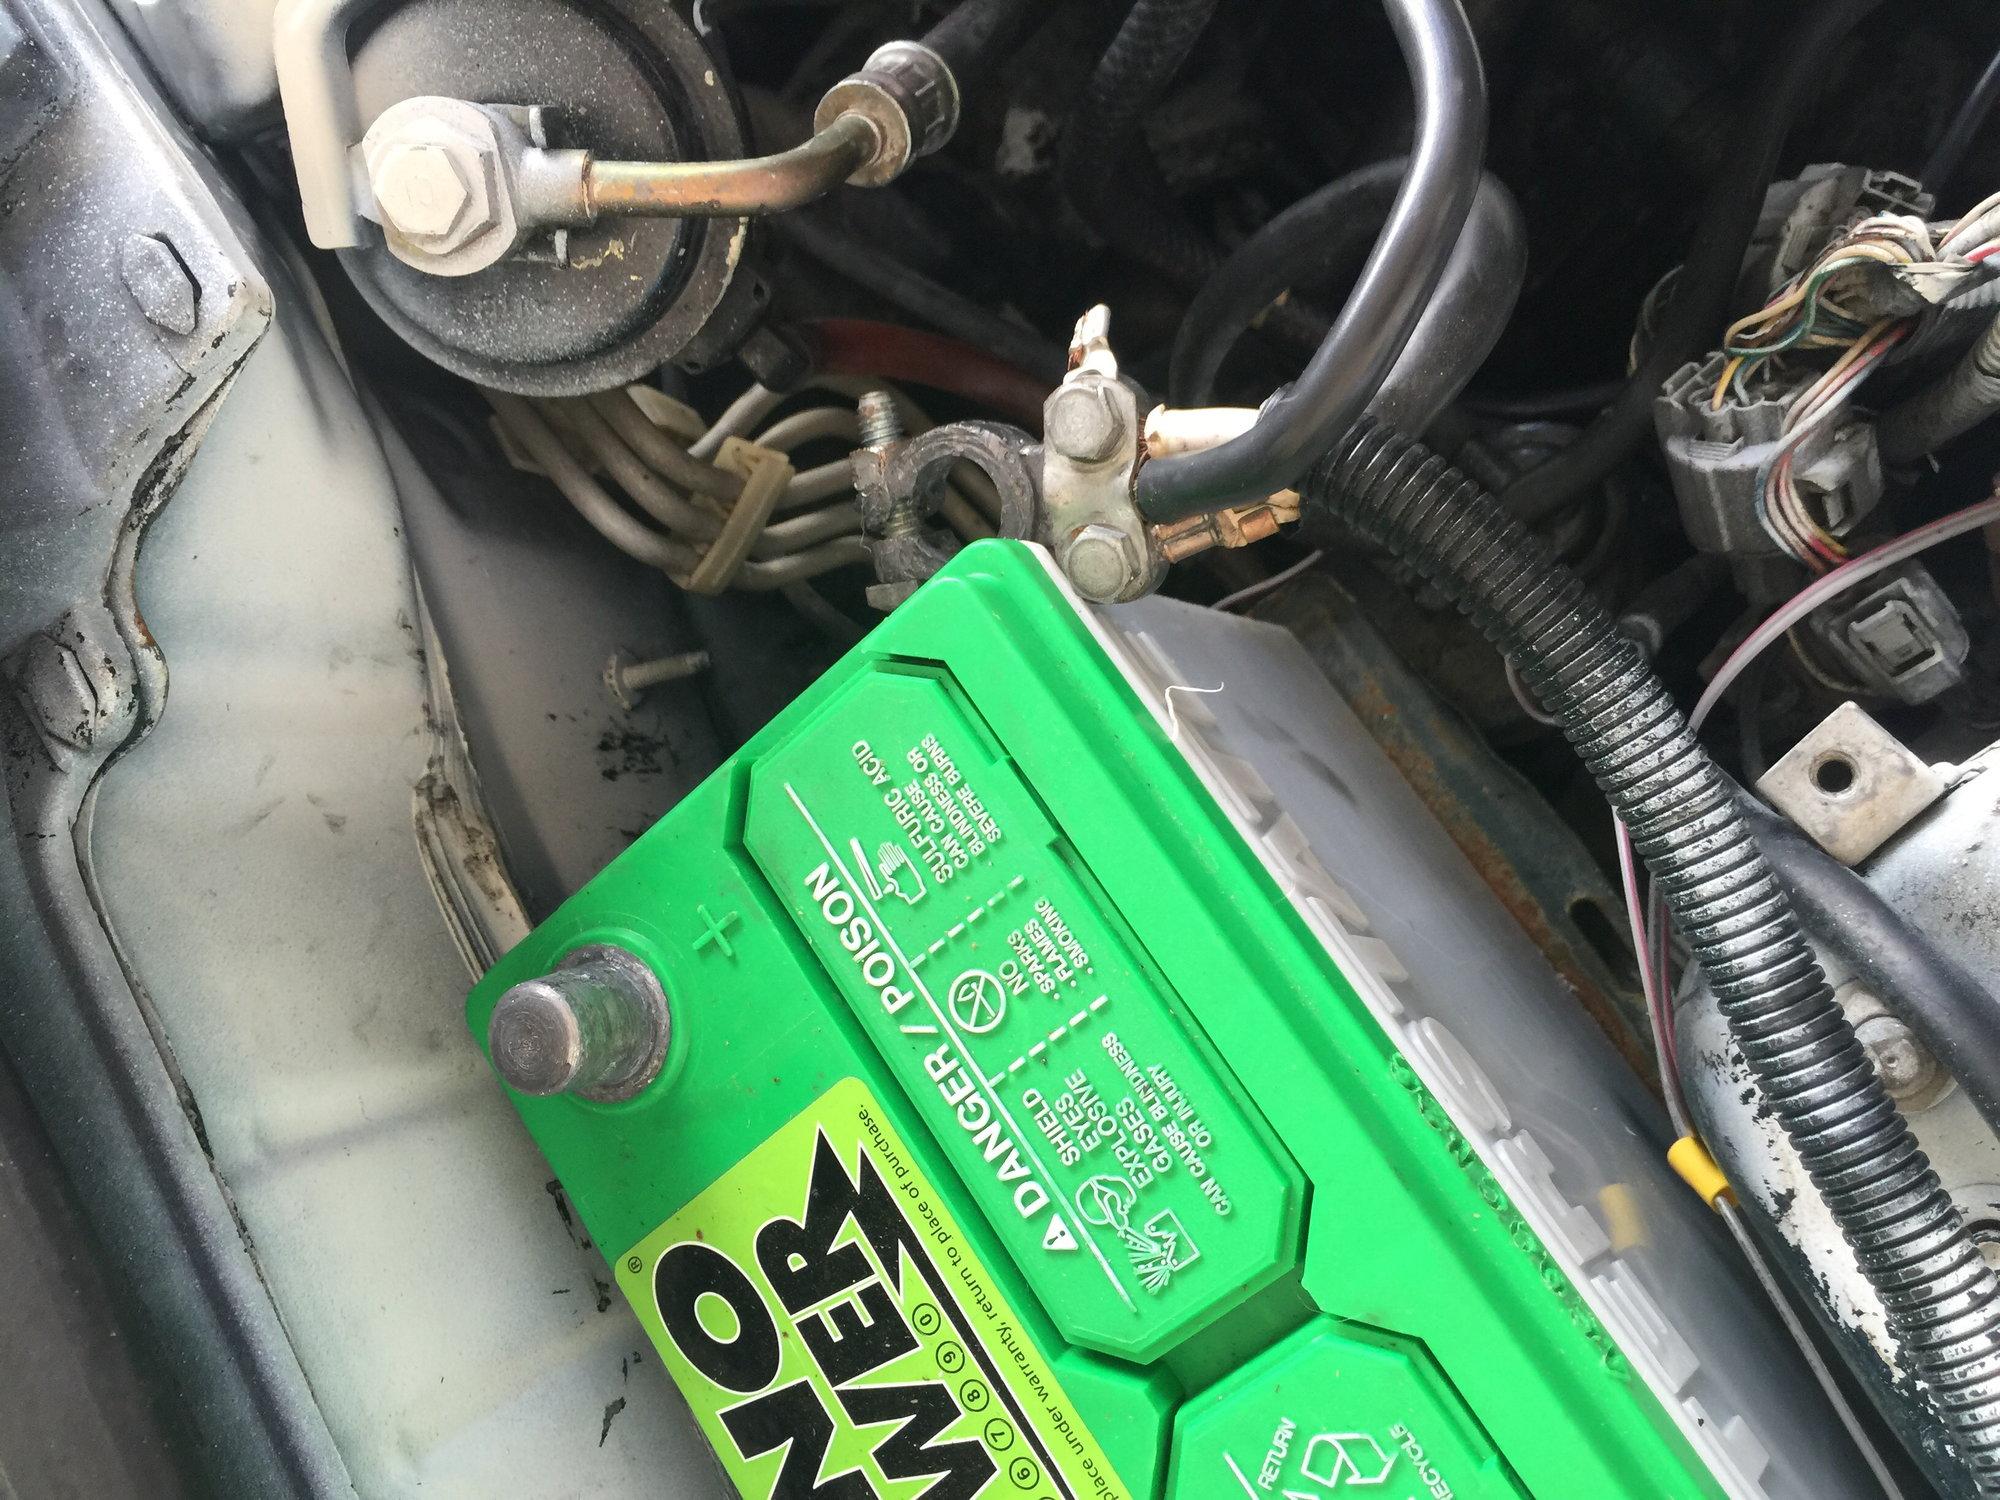 Swapped intake manifold car stuck in limp mode HELP!!! - Honda-Tech